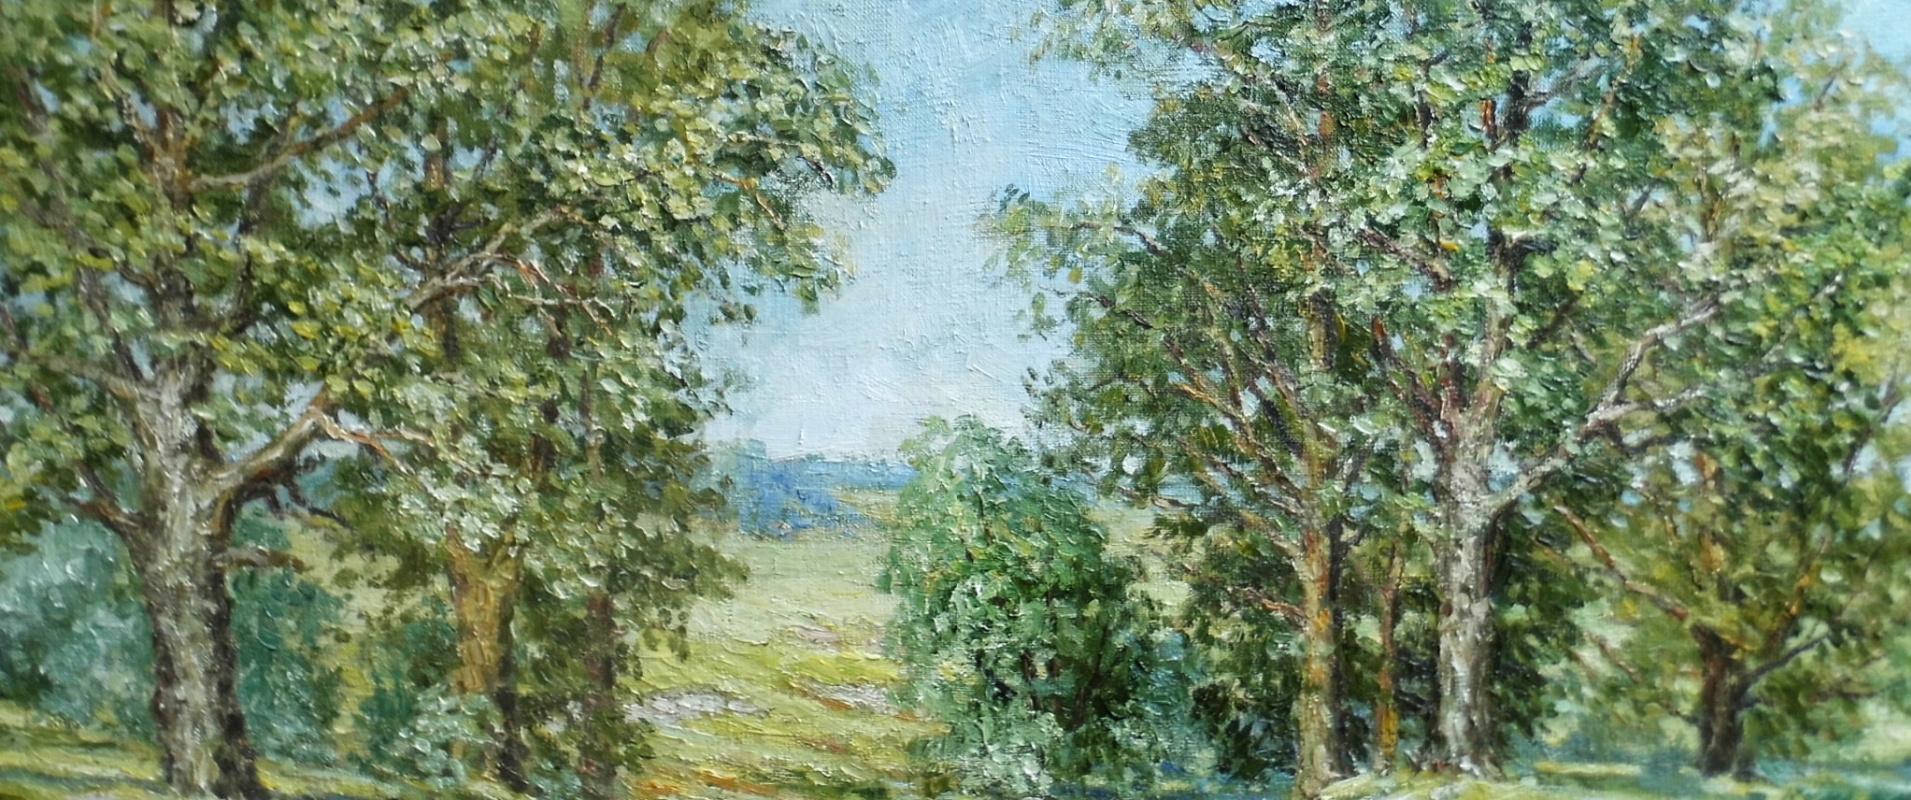 Victor Vladimirovich Kuryanov. Oaks on the edge of a ravine